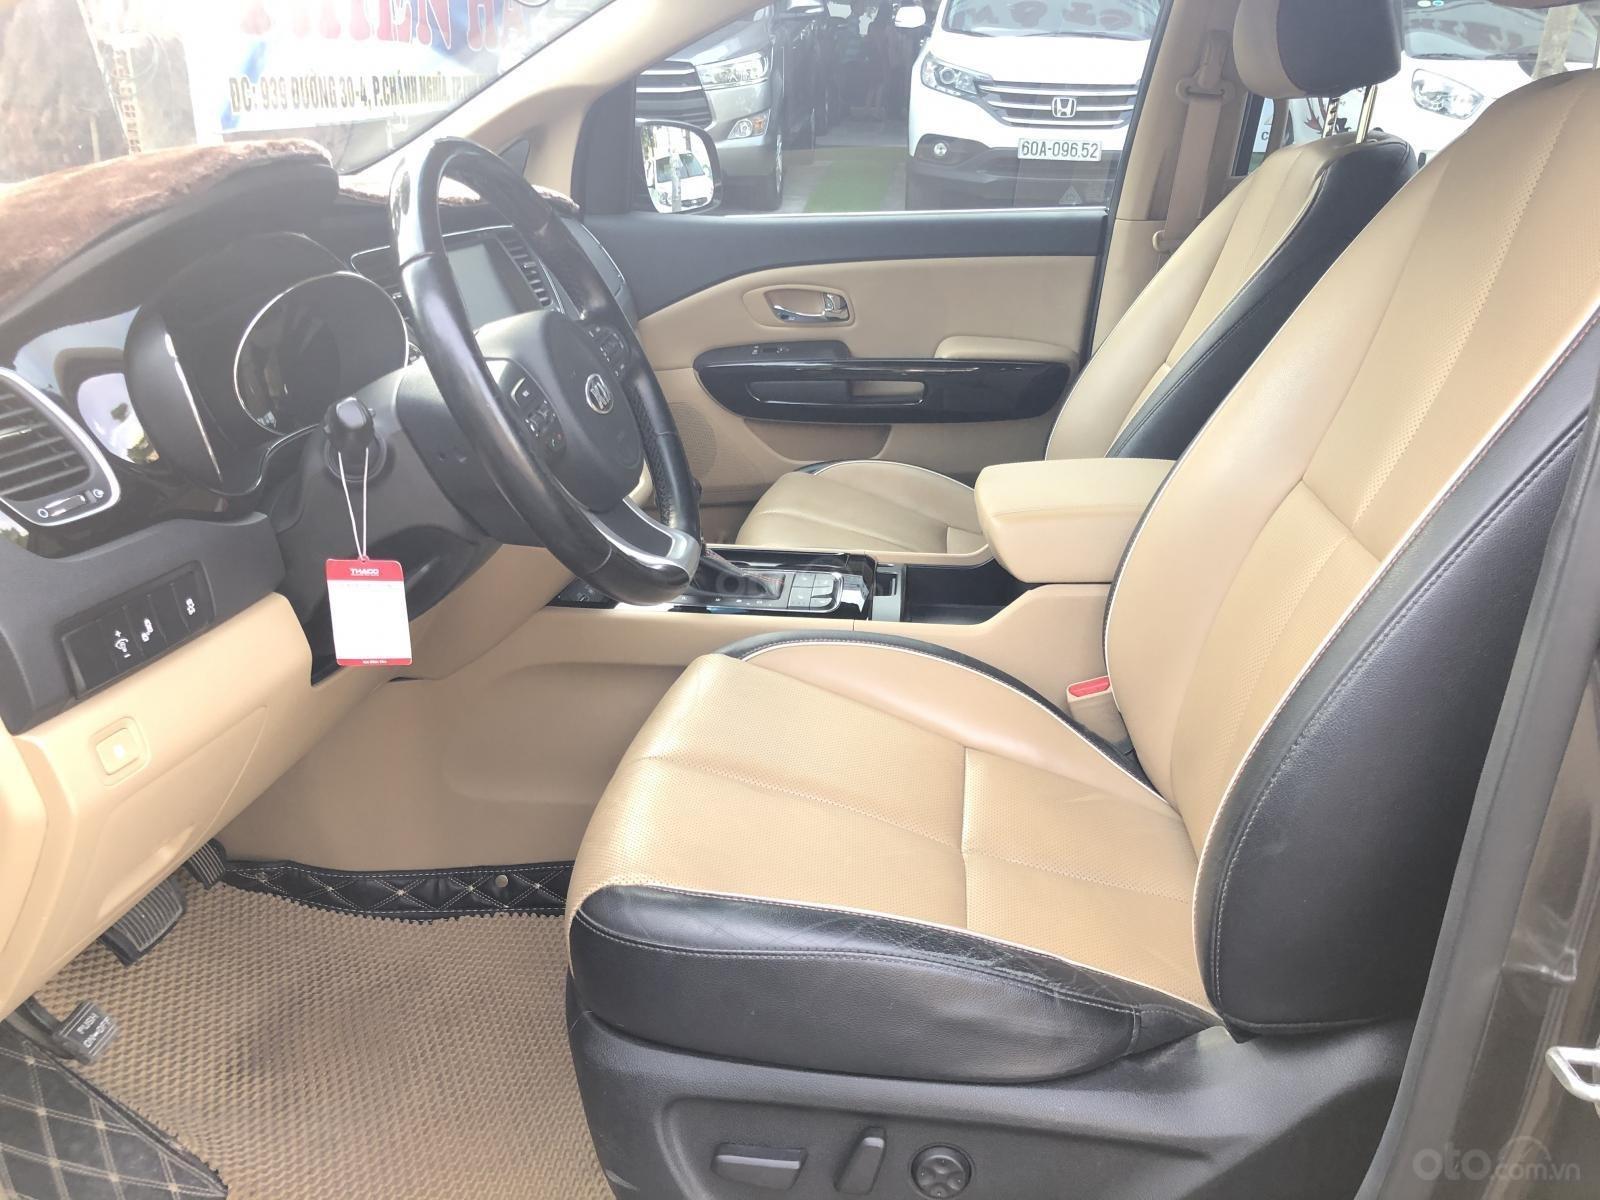 Cần bán xe Kia Sedona 3.3 GATH đời 2015, màu nâu (5)